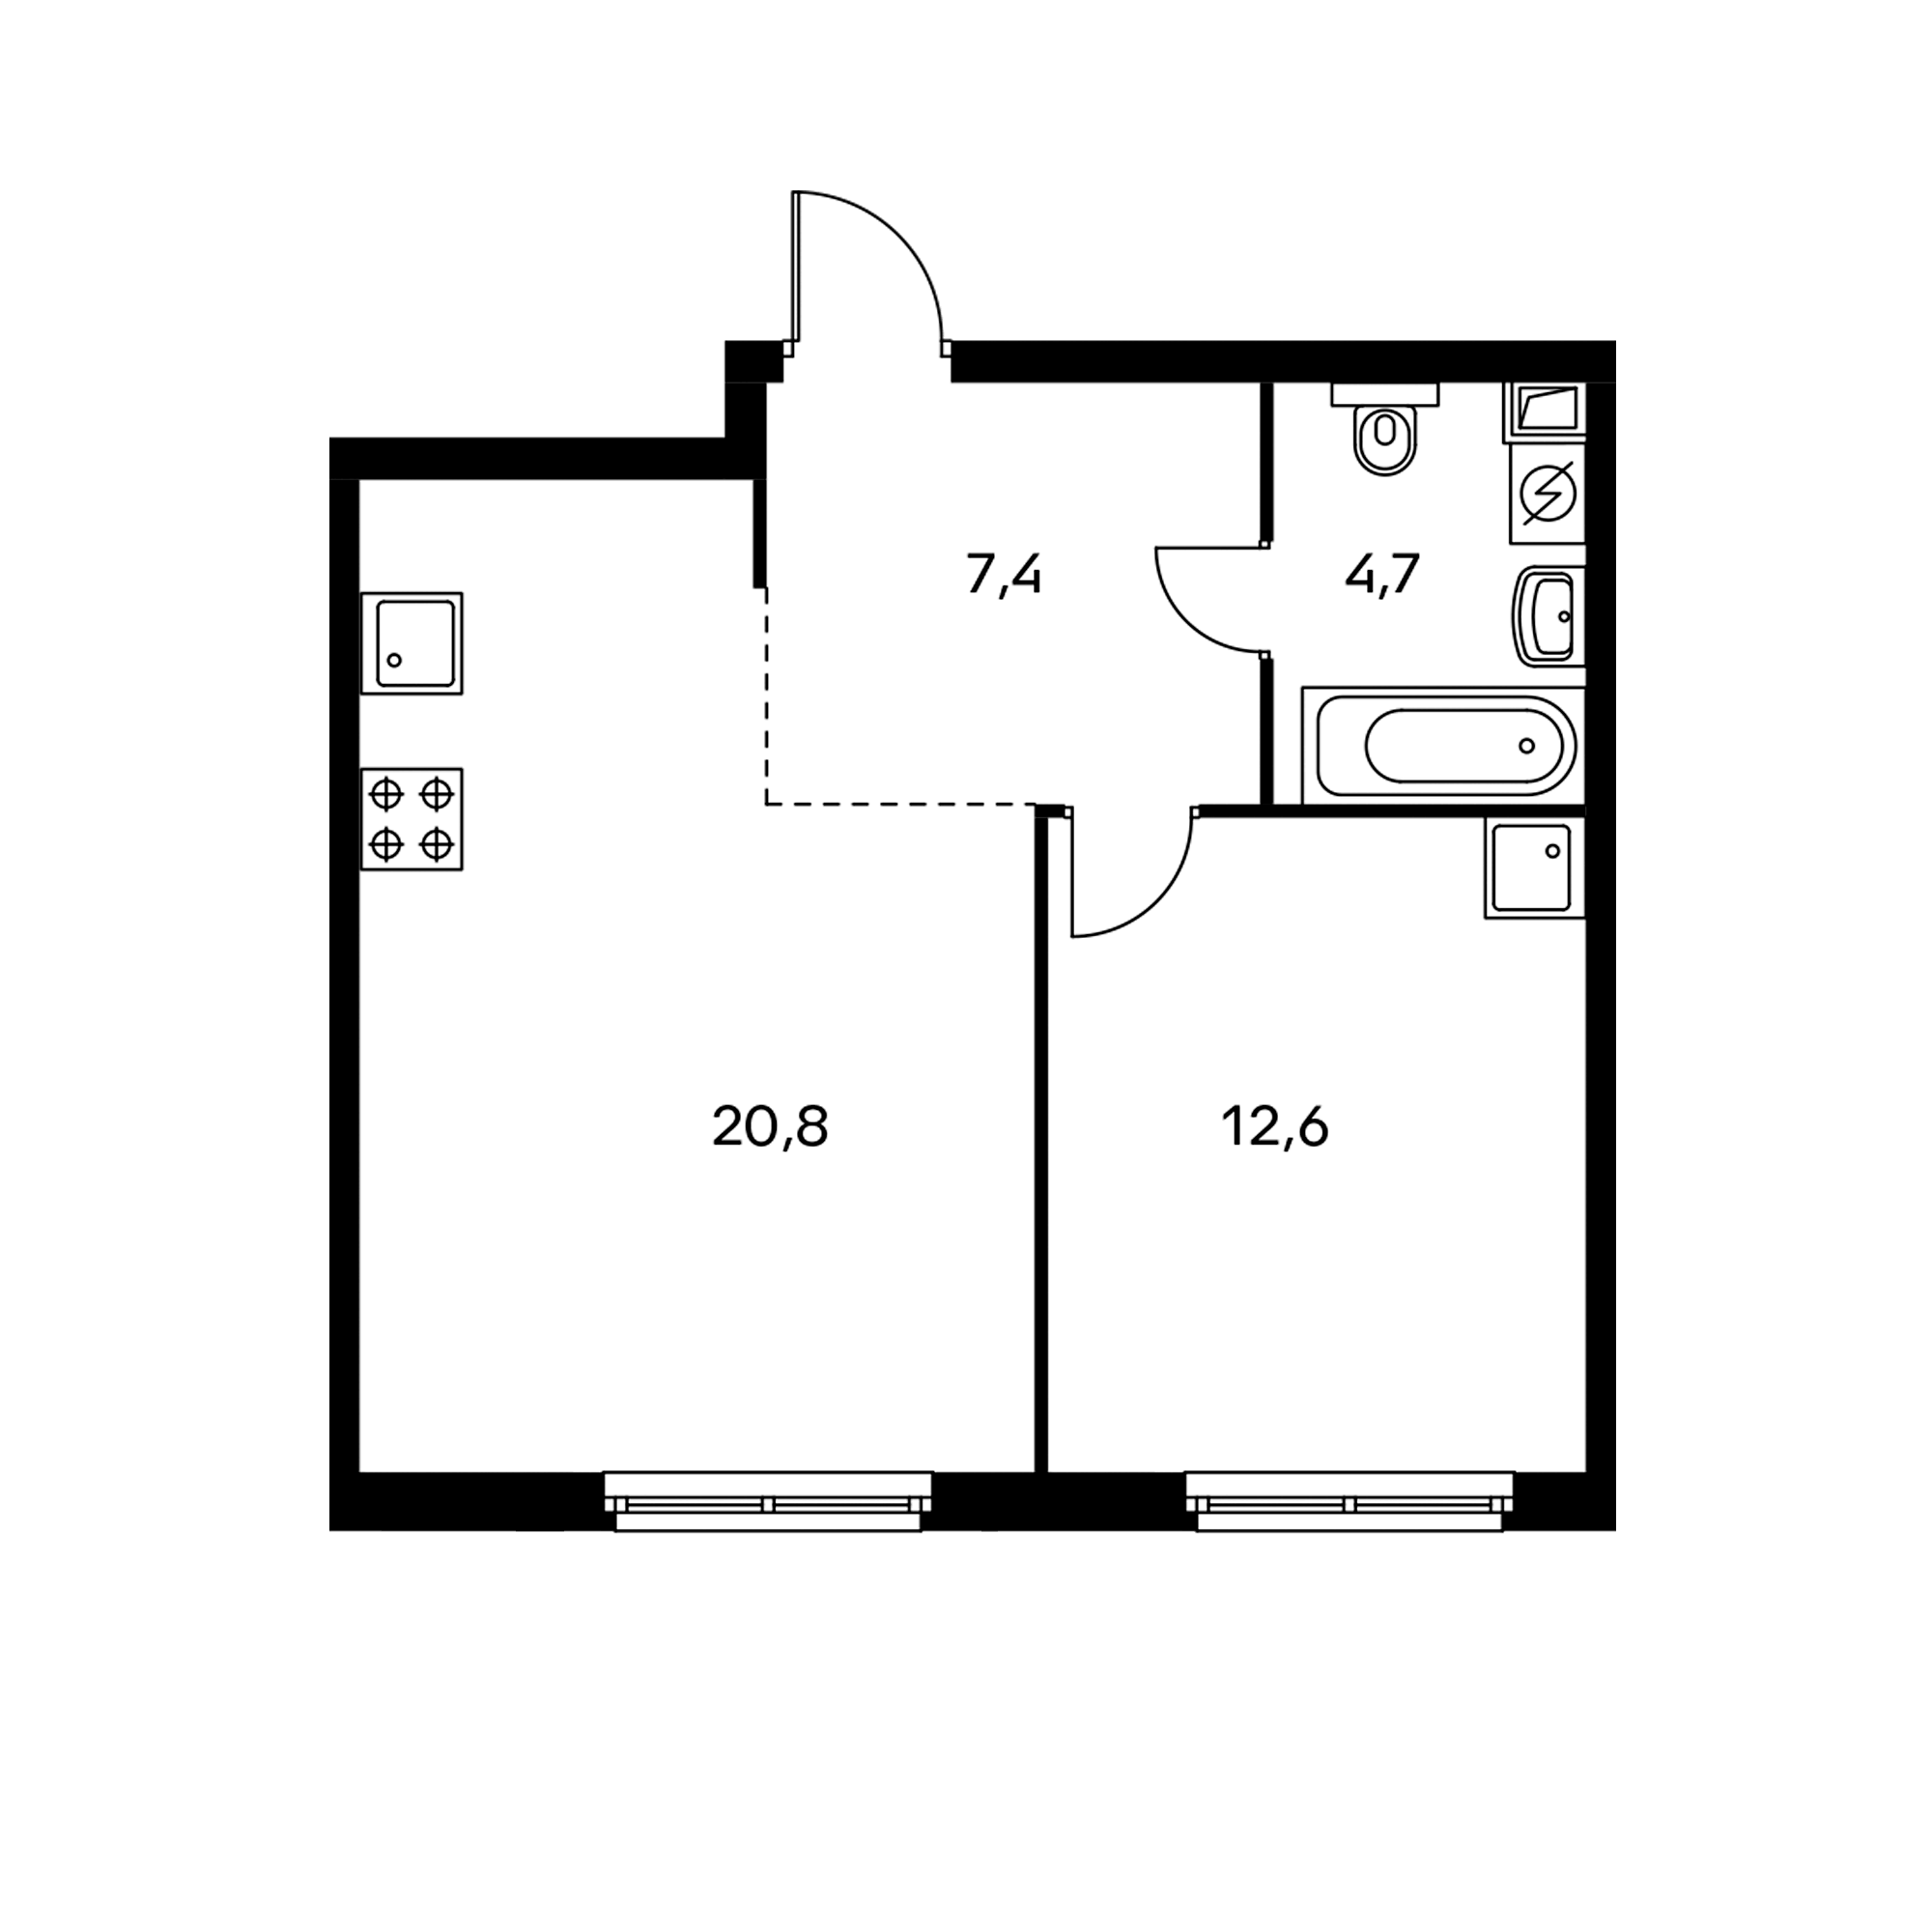 1EL4_6.0-1